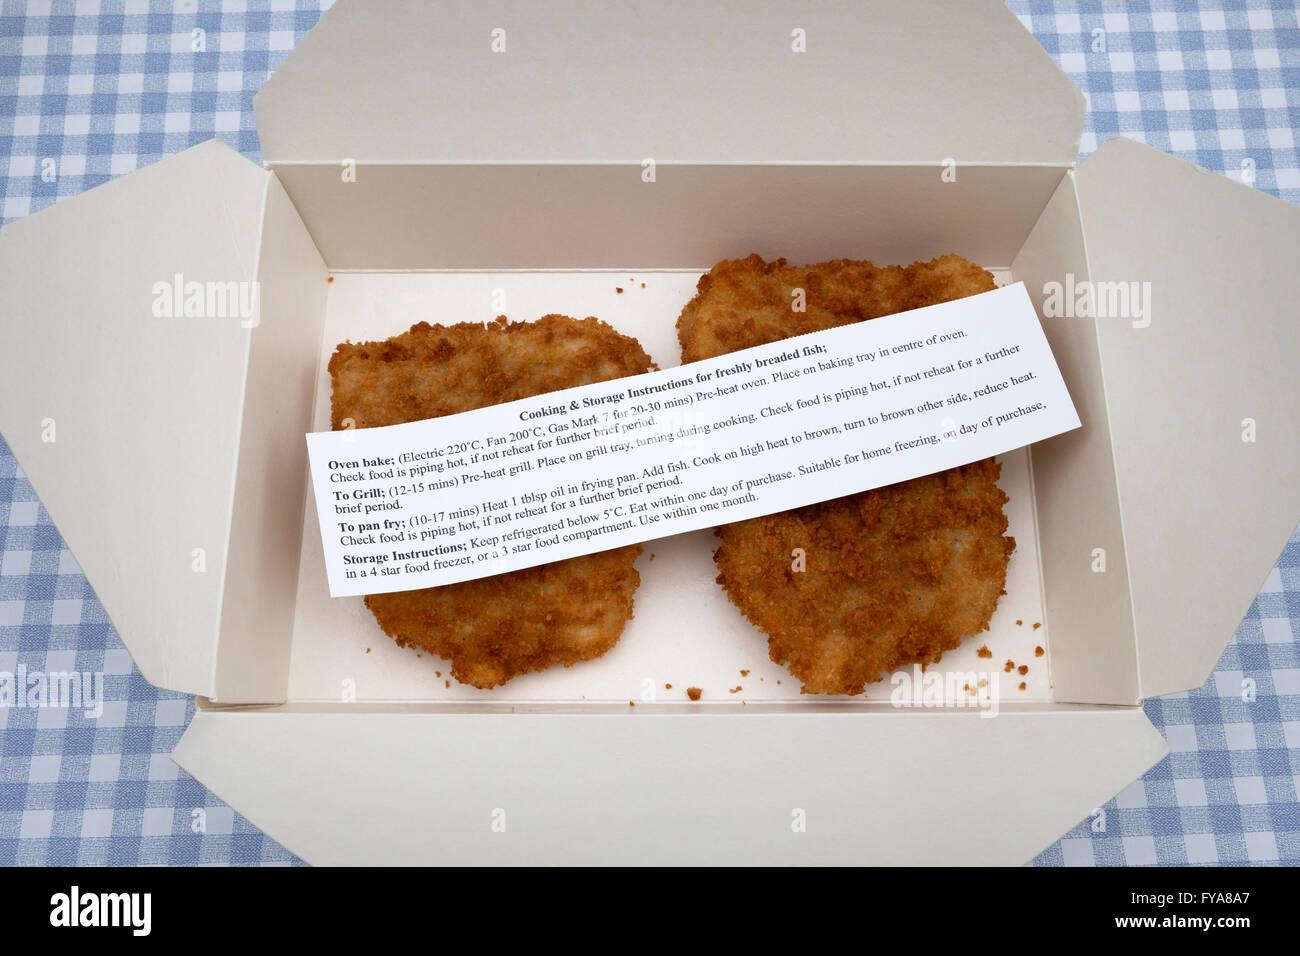 Waitrose fresh Cod breaded fish - Stock Image